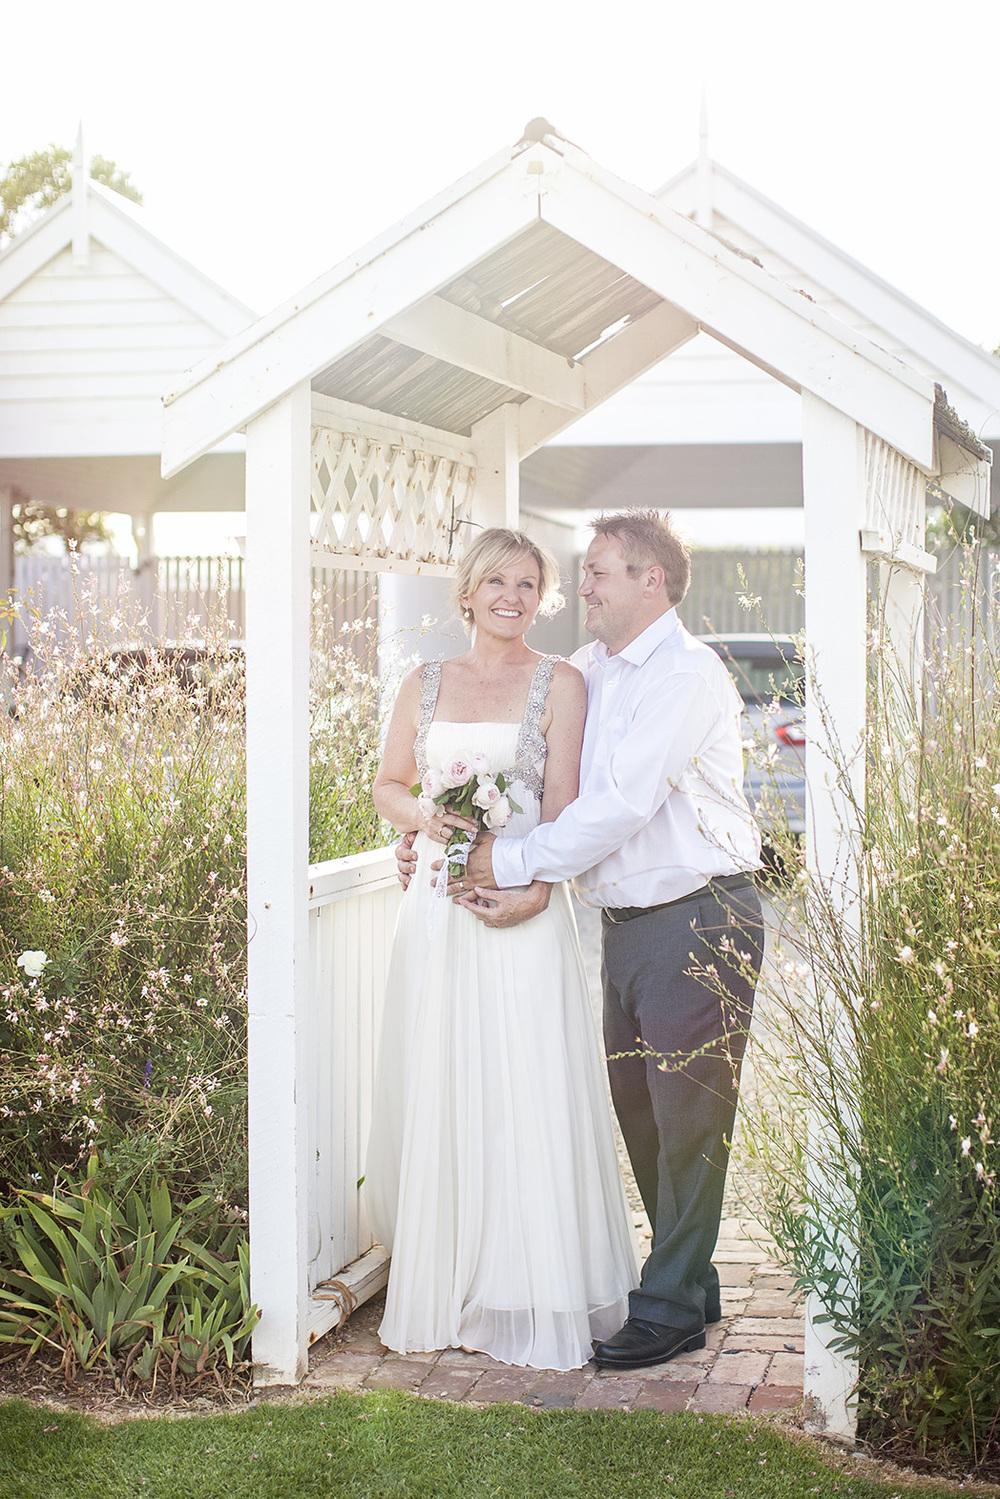 Middleton Beach Huts Wedding Photography South Australia 14.jpg